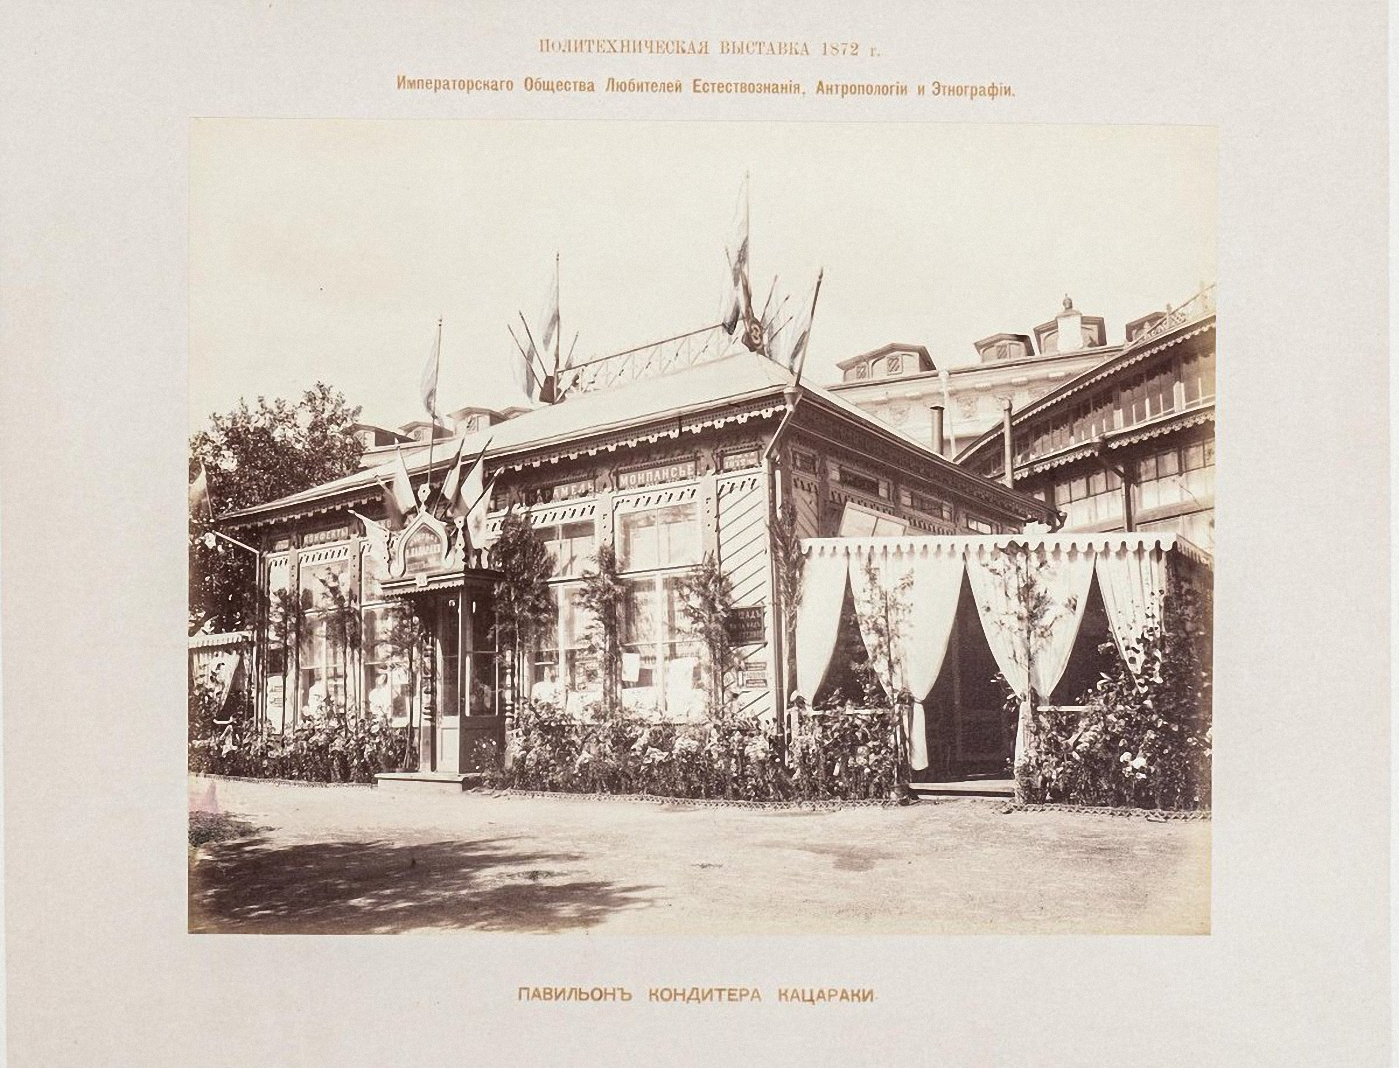 Александровский сад. Павильон кондитера Кацараки